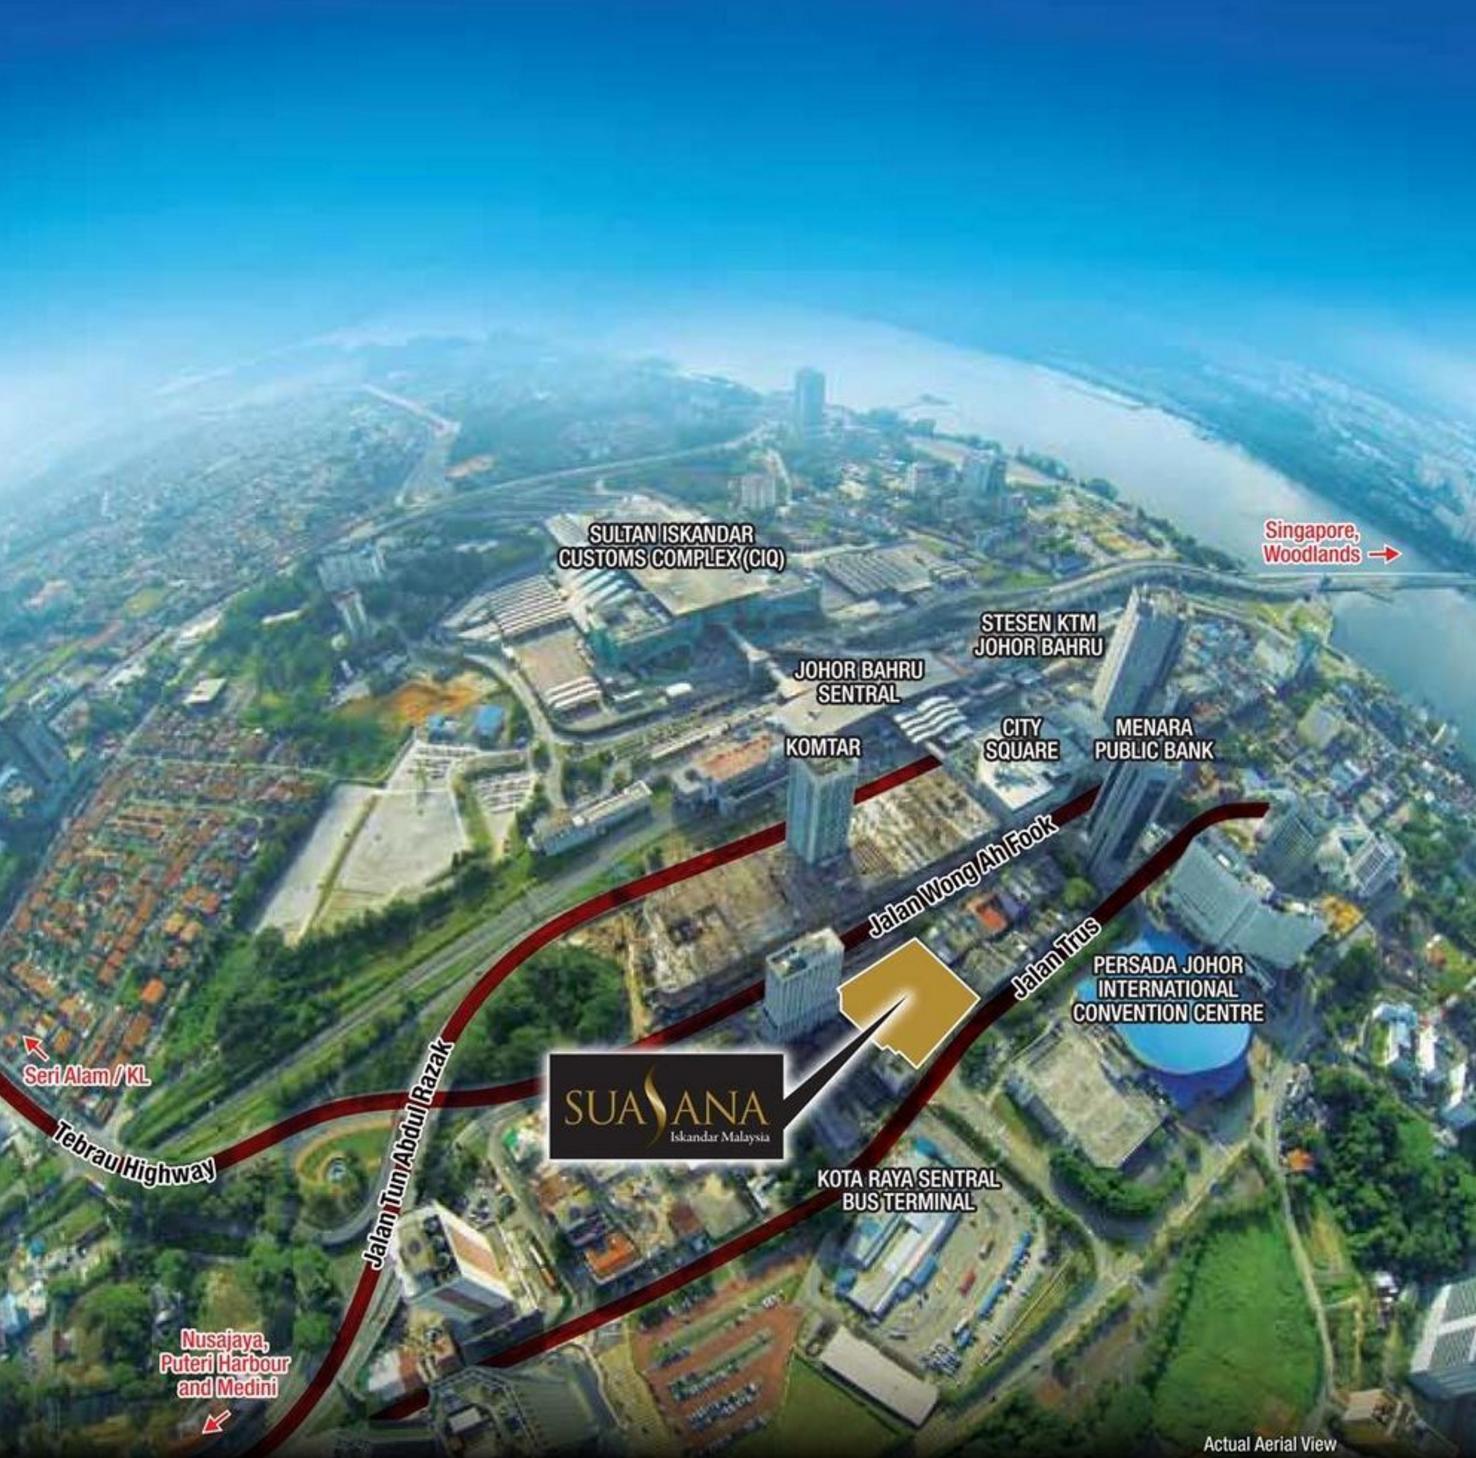 suasana-iskandar-malaysia-skyview